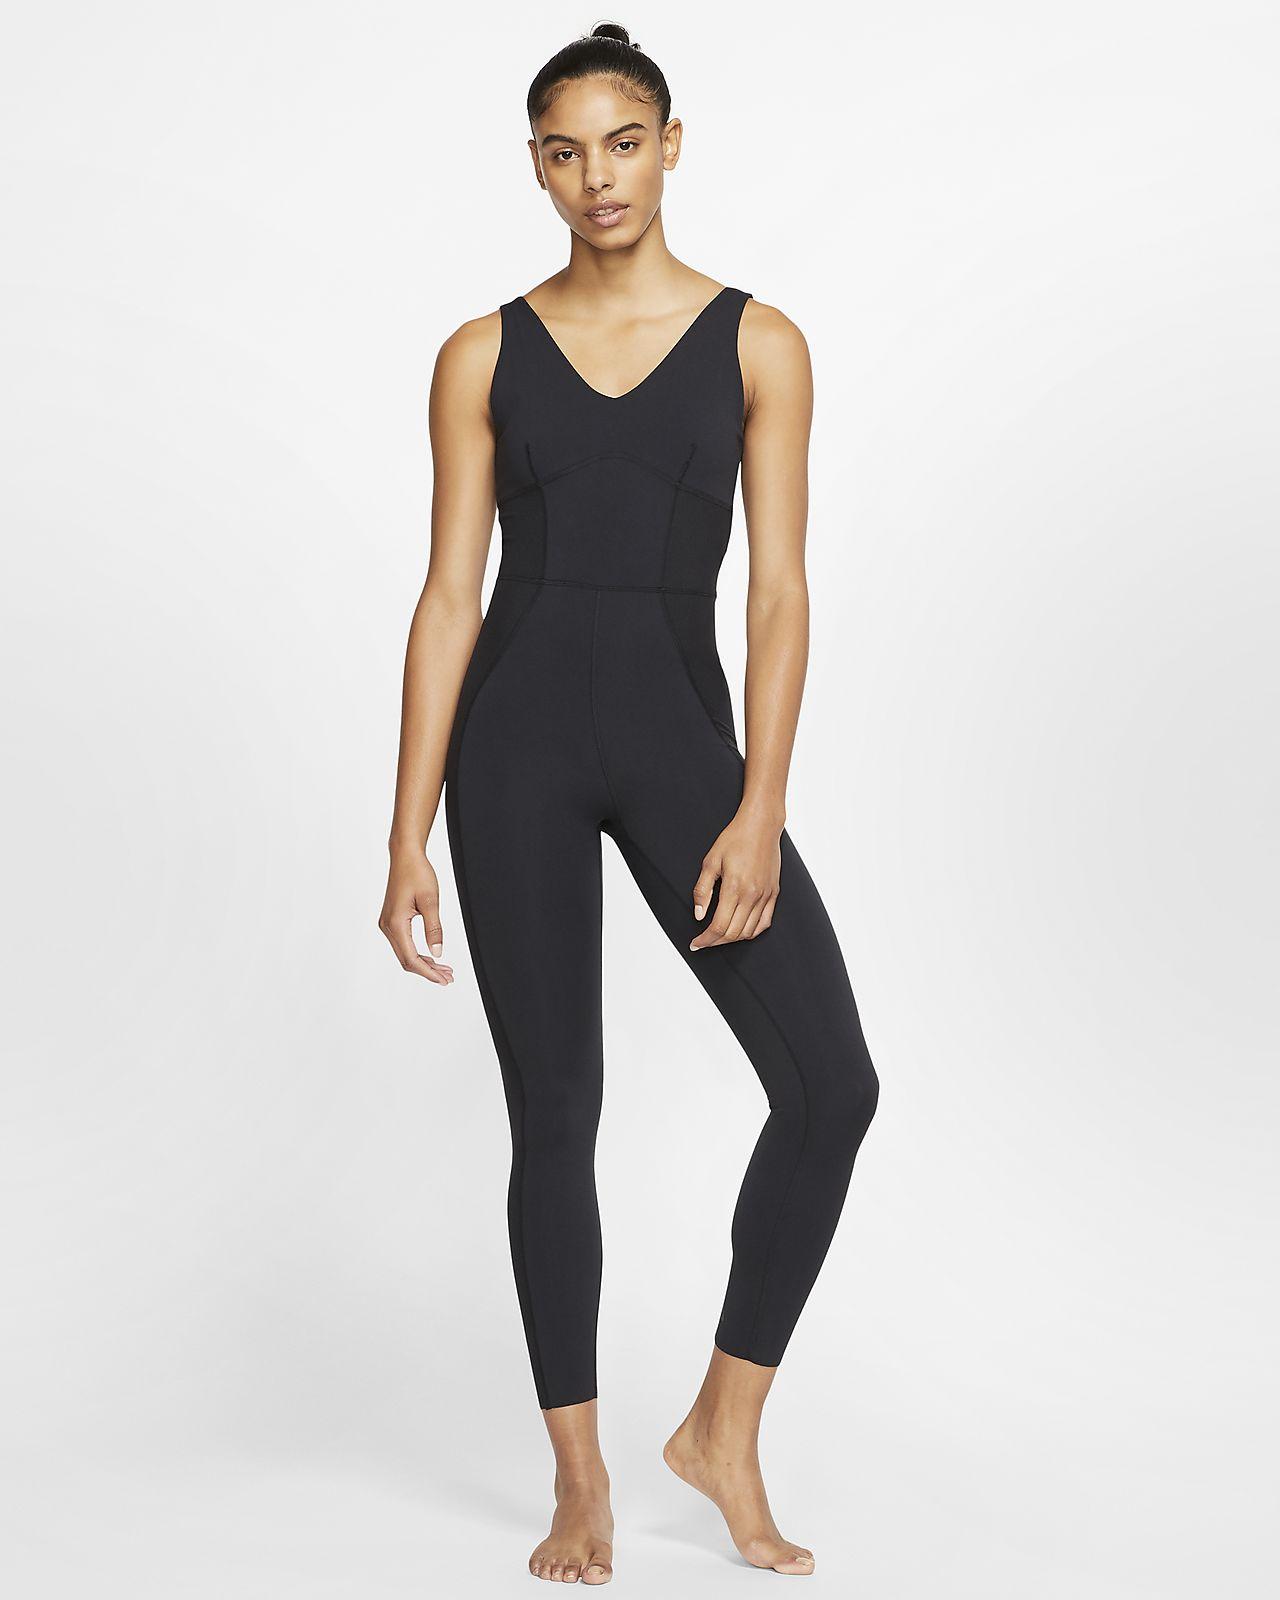 Nike Black Air Women's Jumpsuit